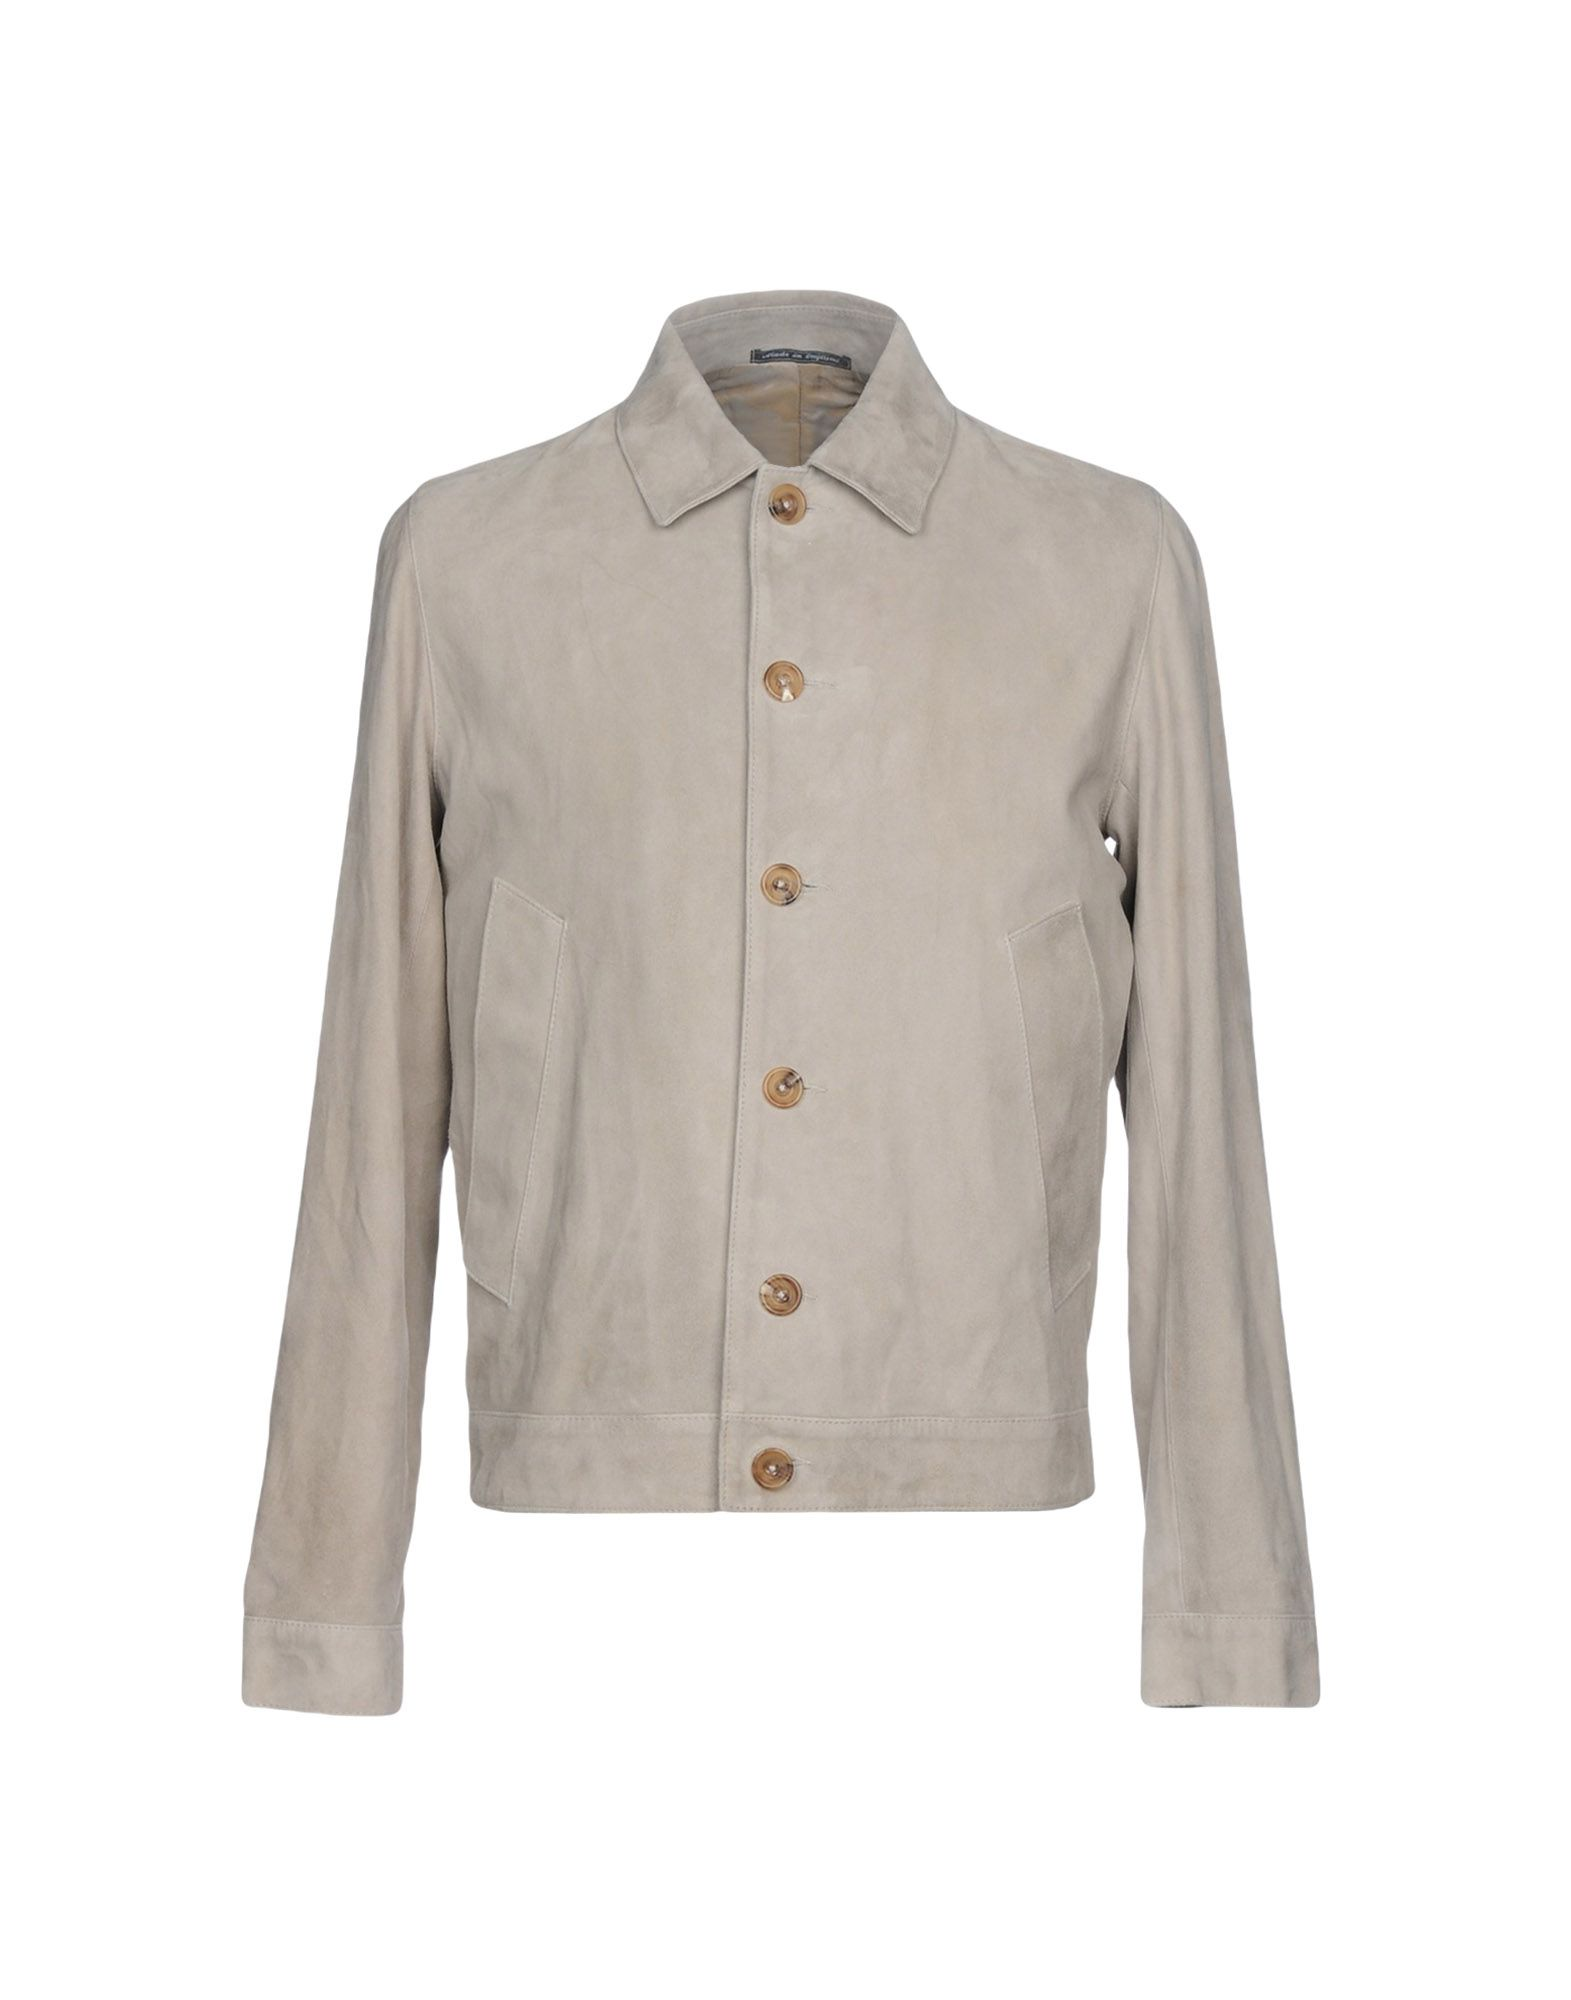 RICHARD JAMES Leather Jacket in Light Grey